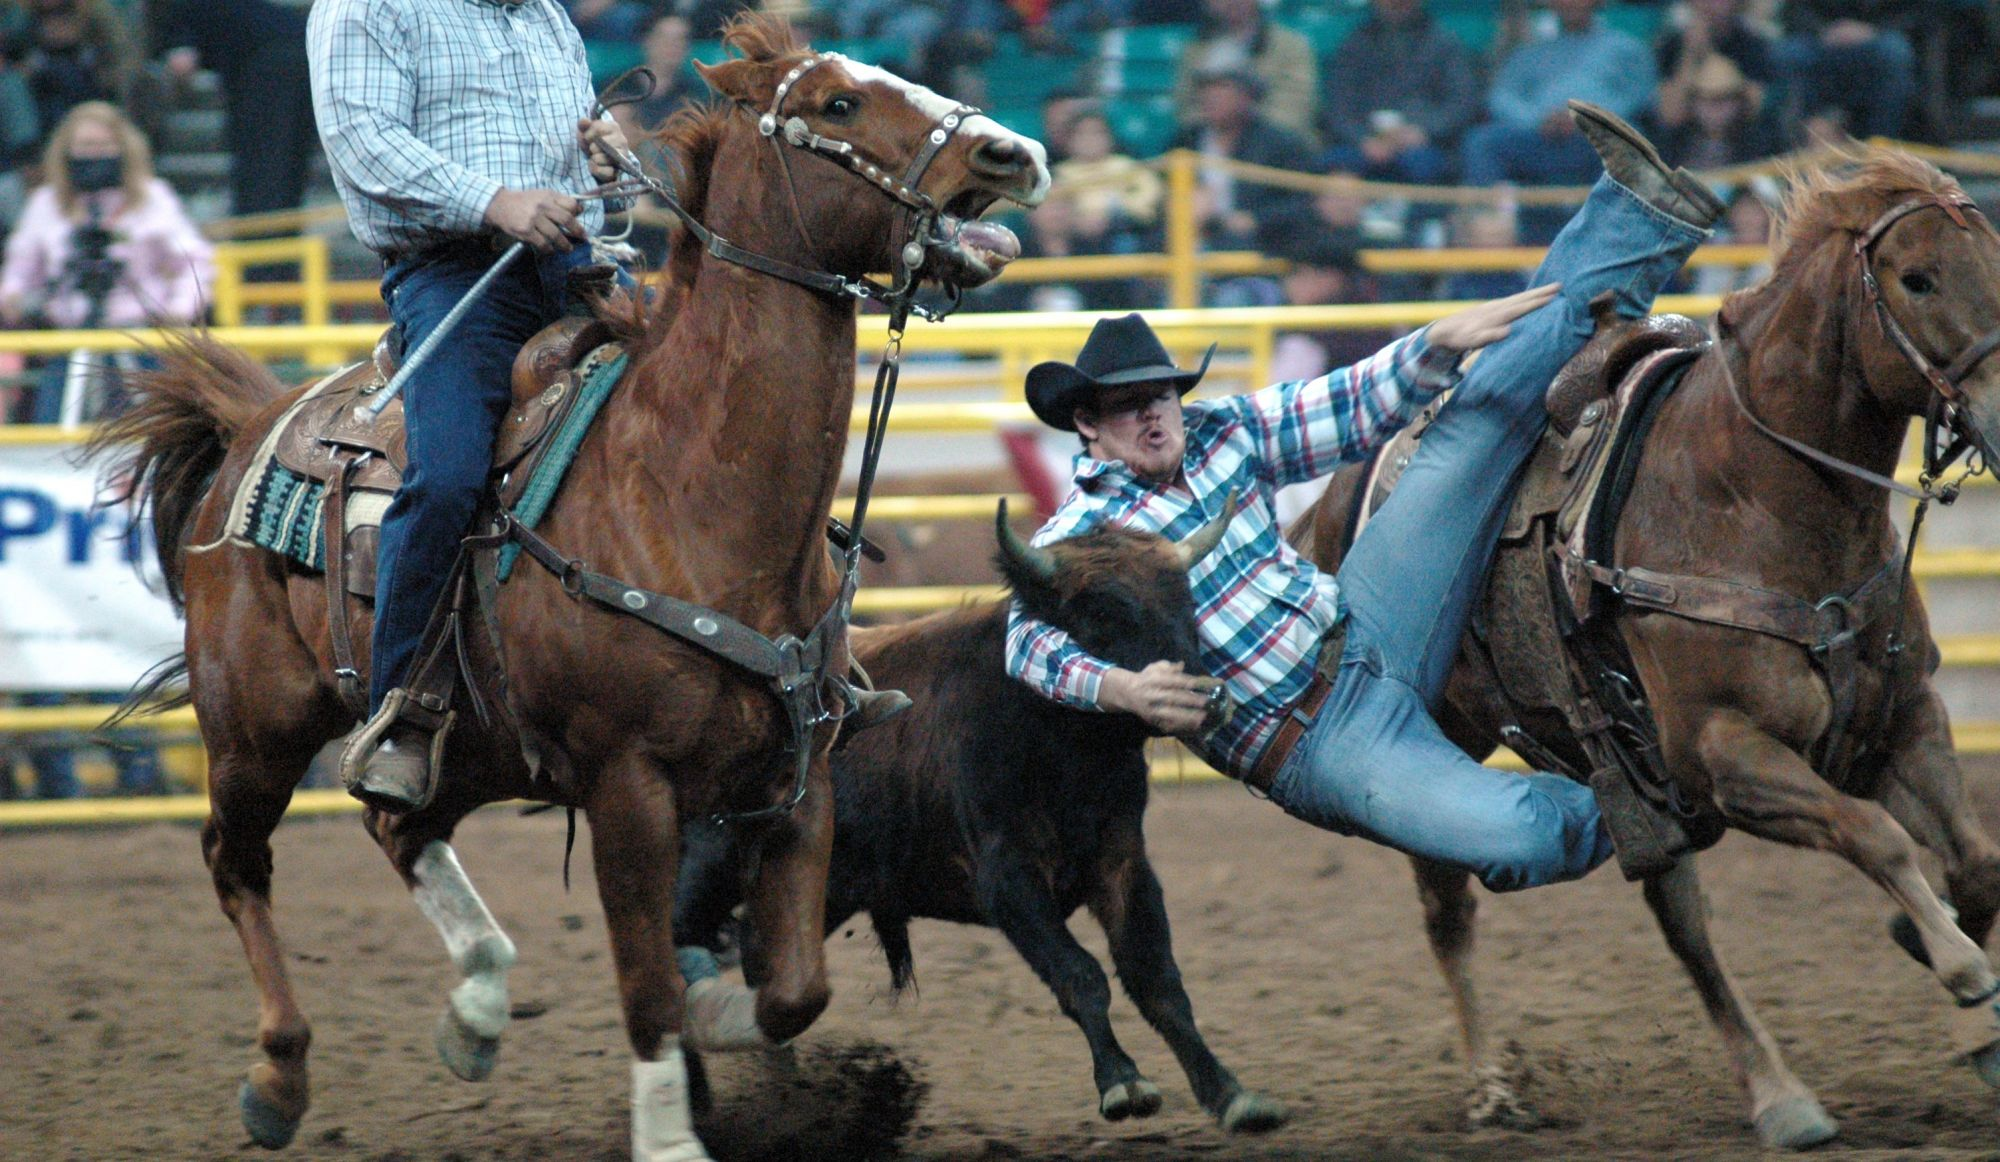 Quebec's Rodeos Deemed Illegal